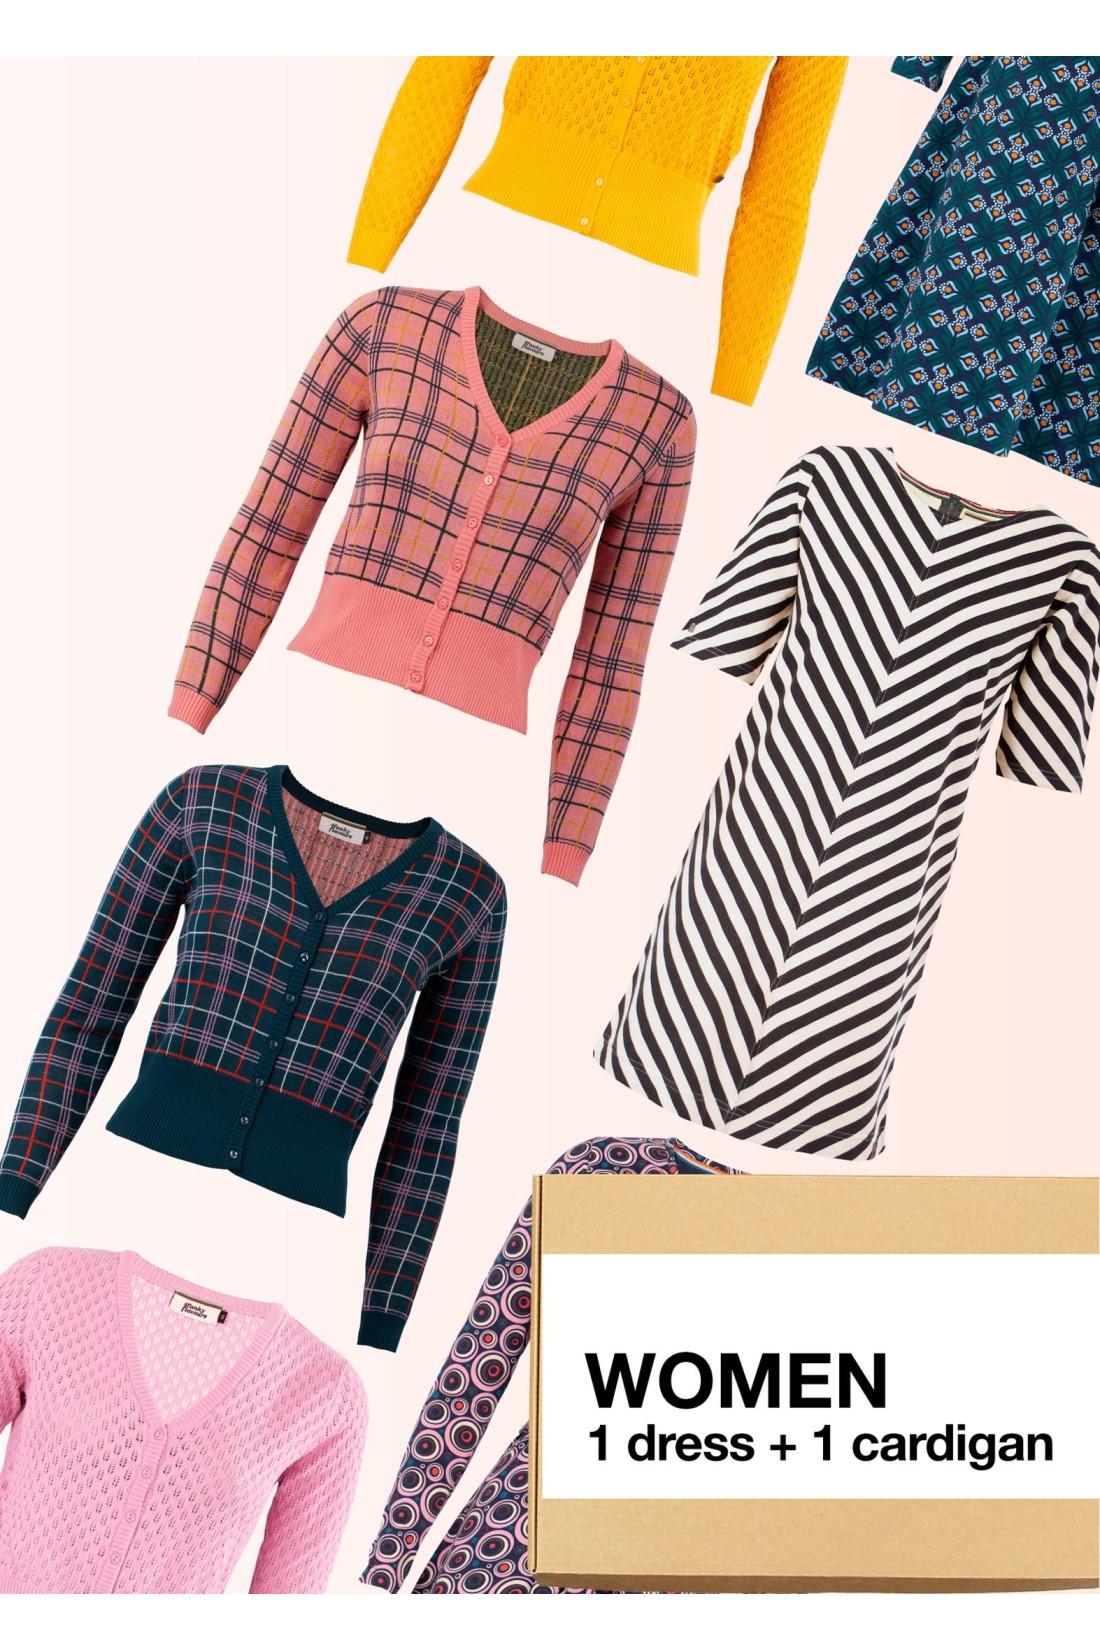 Surprise Box Women - Dress + Cardigan